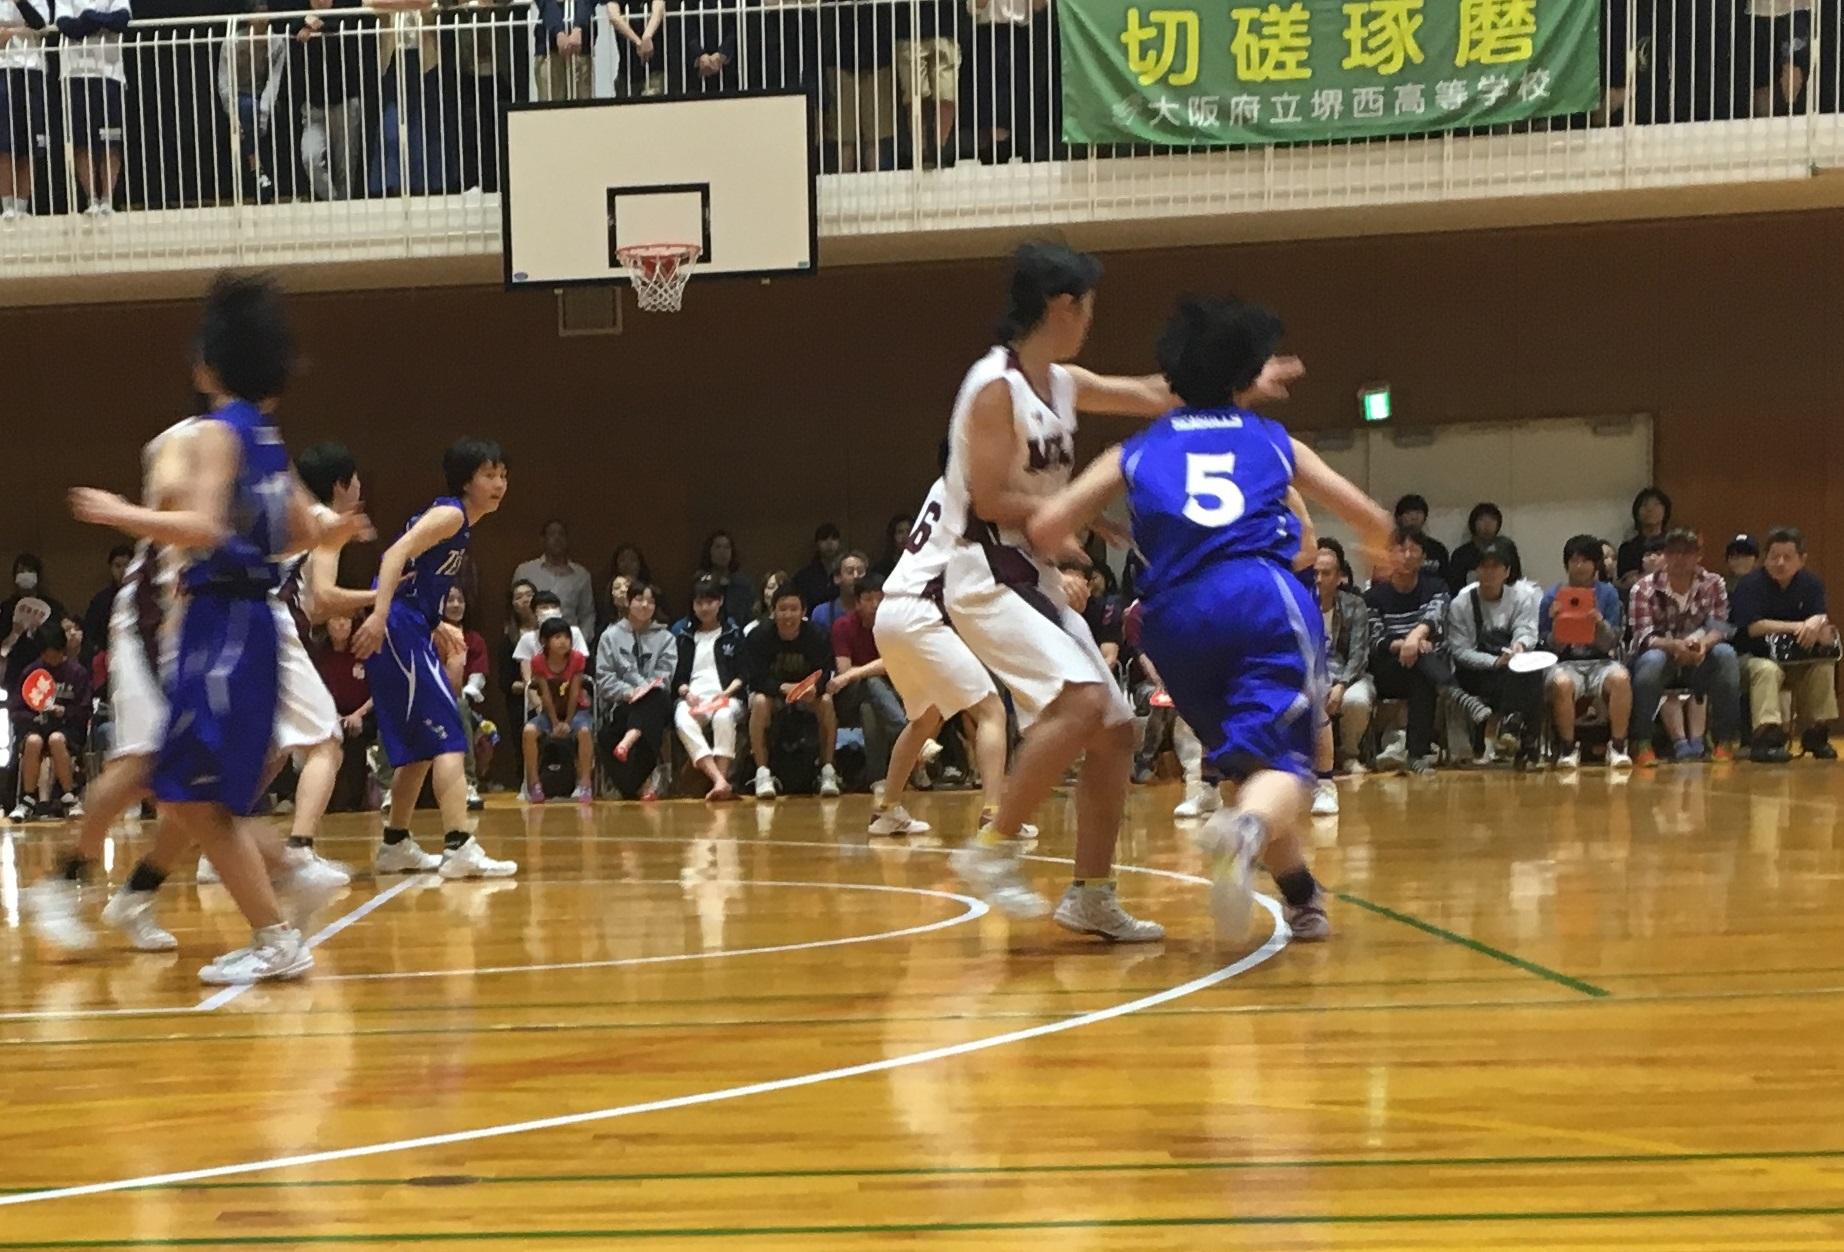 03basket20160508.JPG